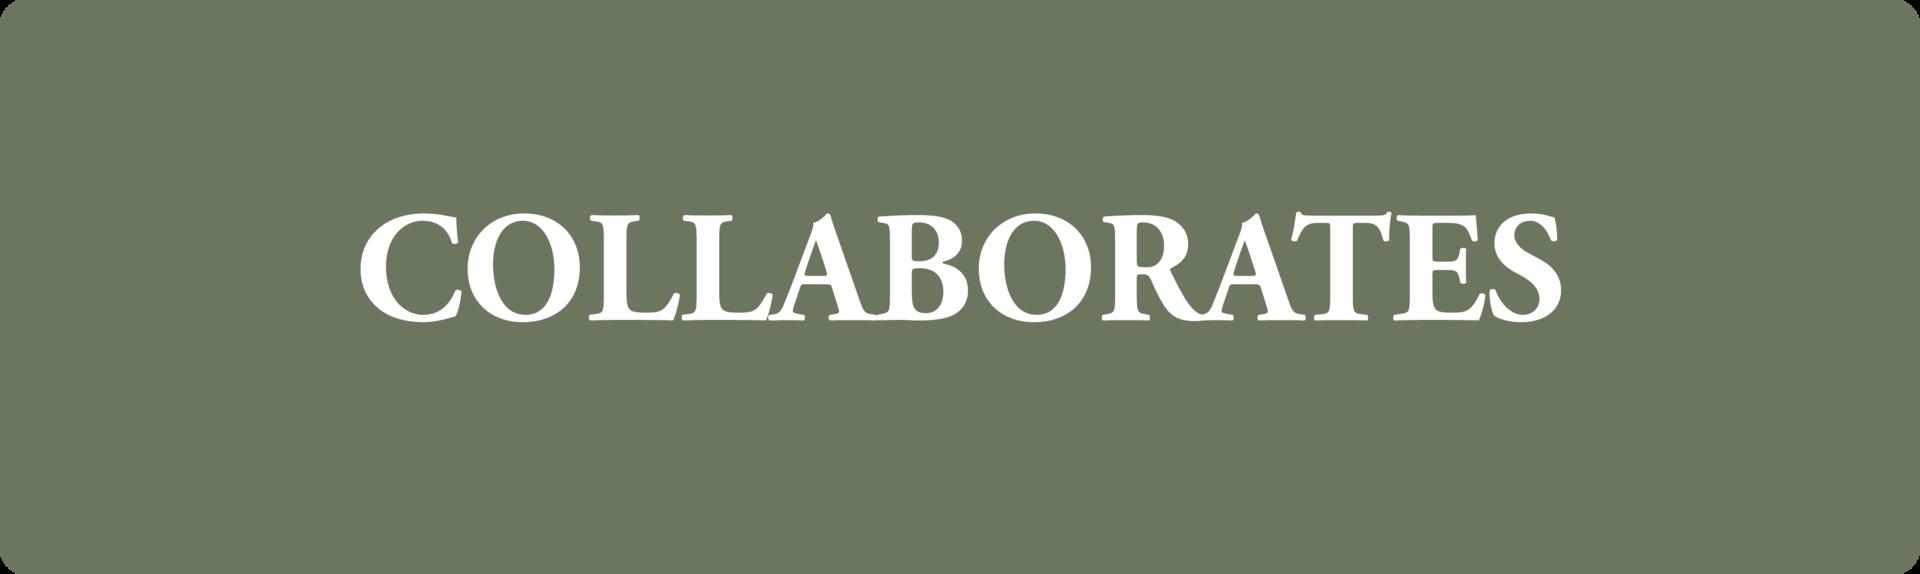 Collaborates